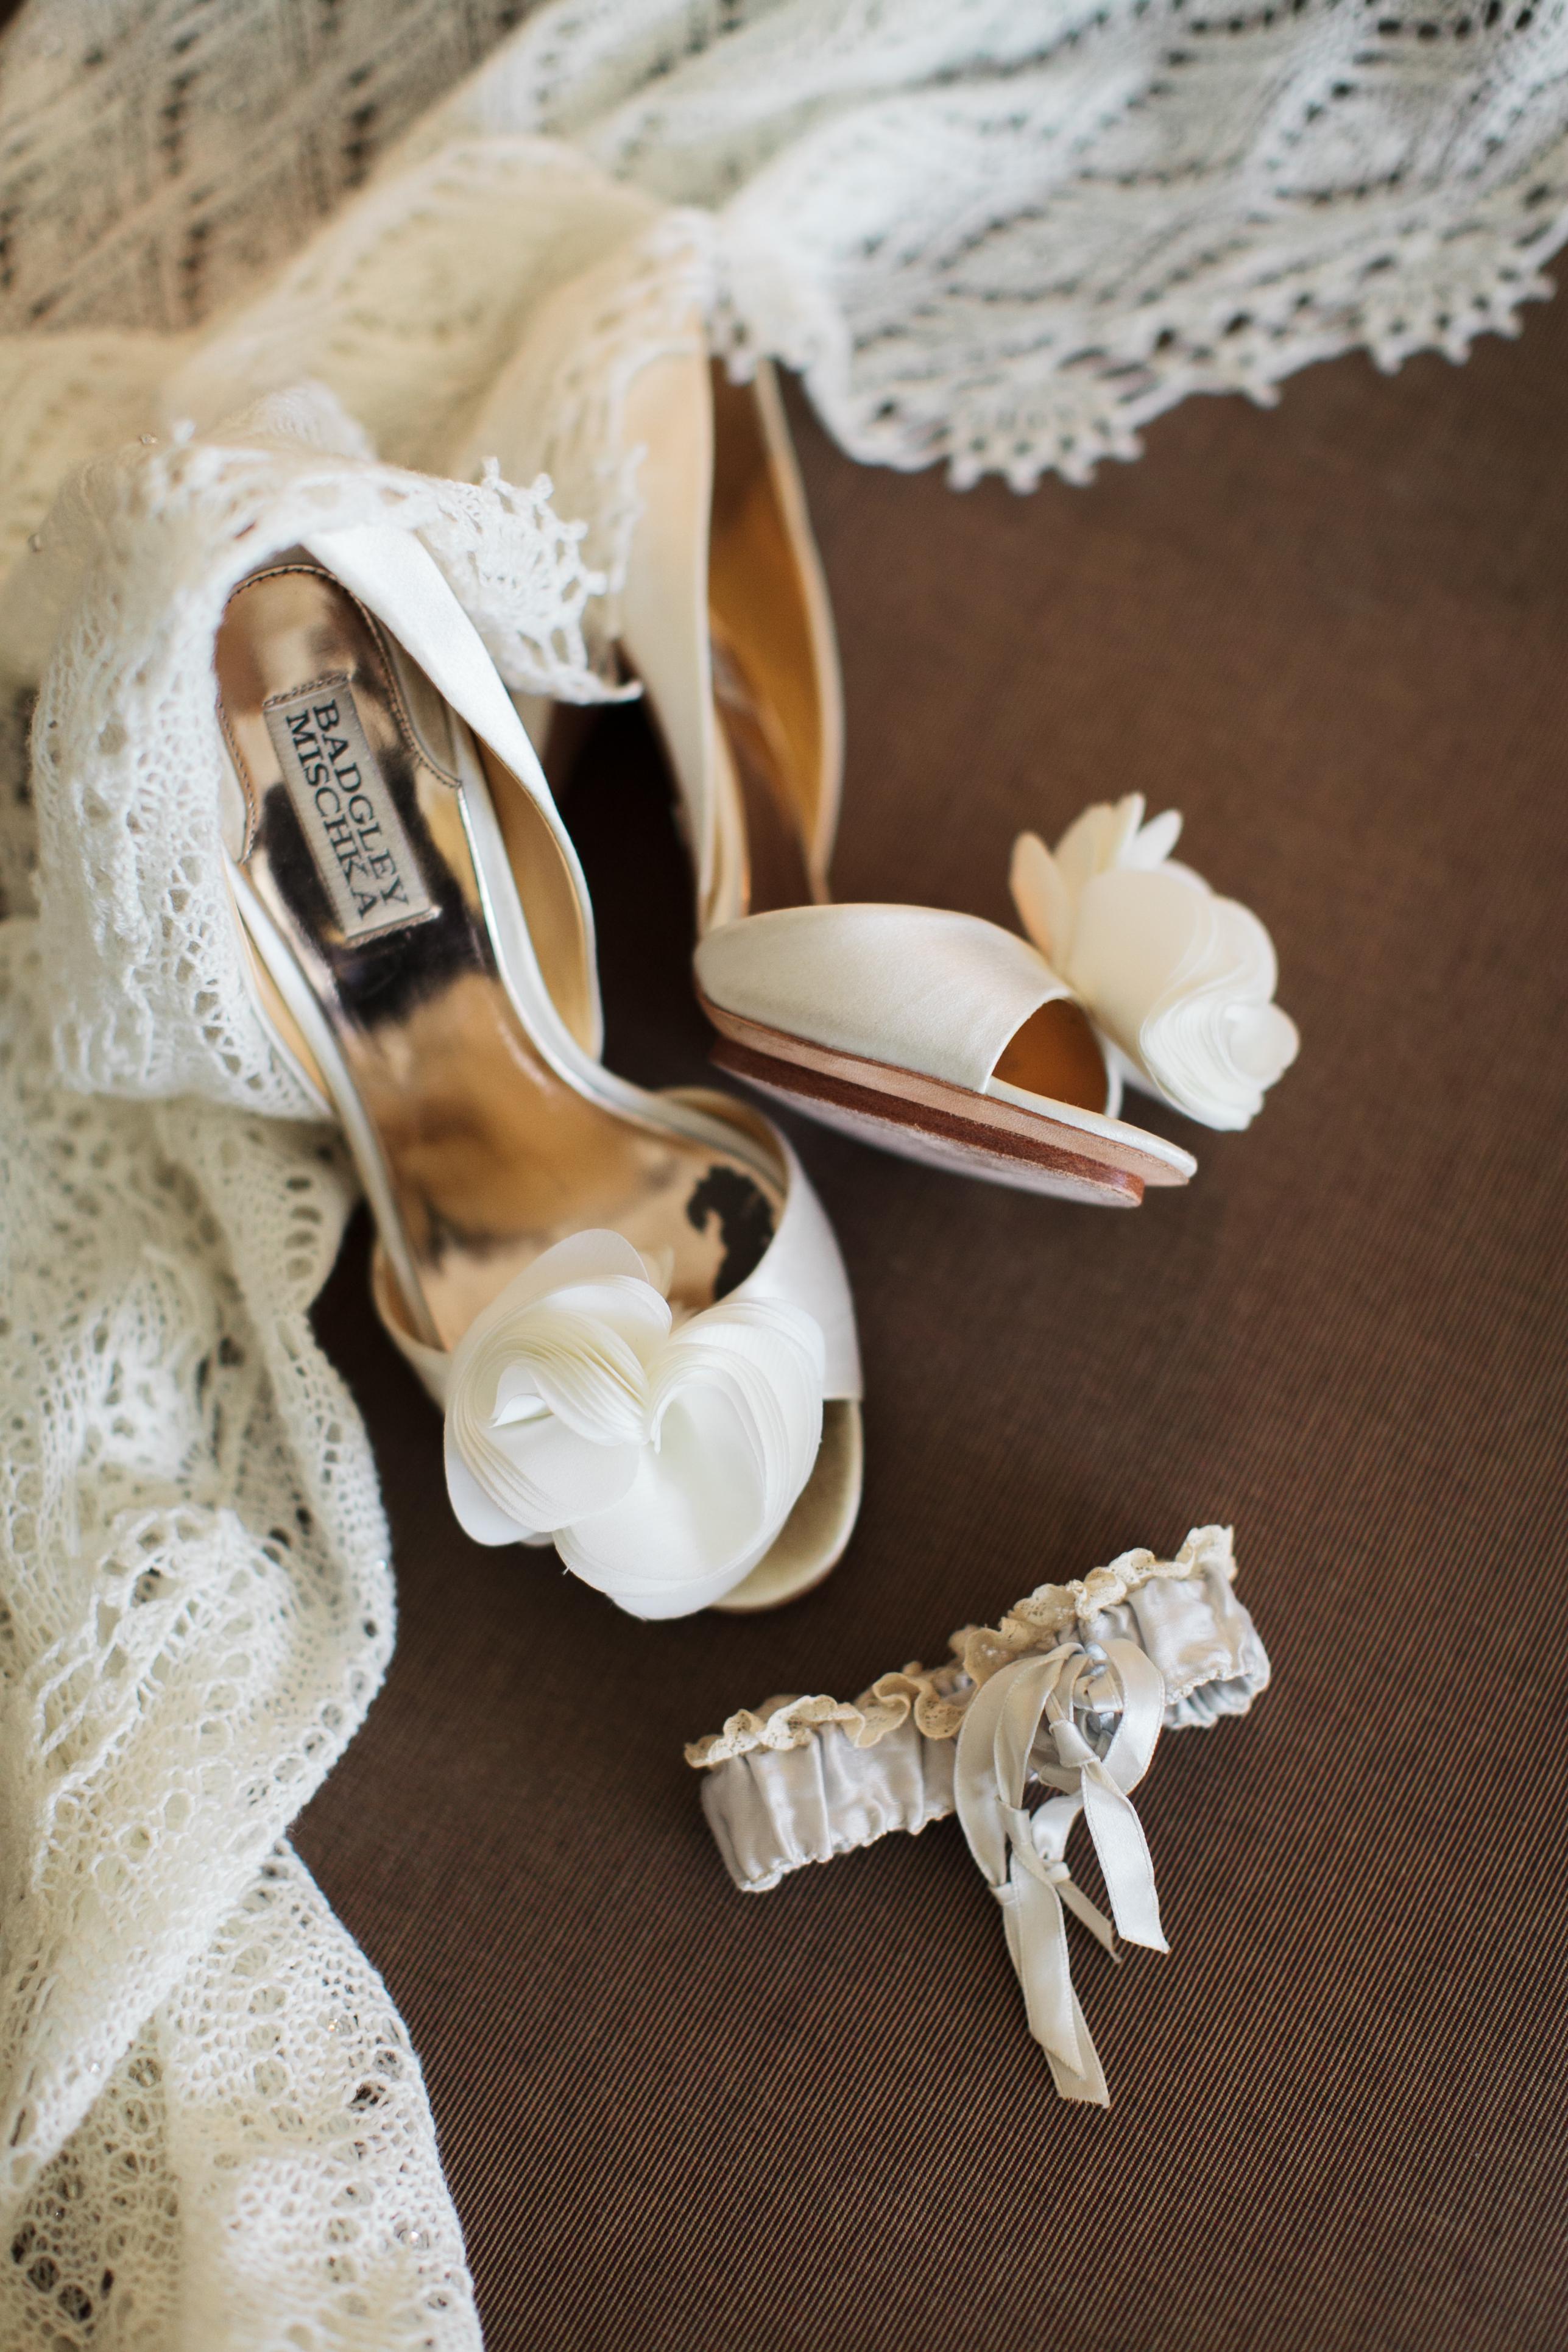 Fashion, Real Weddings, Wedding Style, Accessories, Fall Weddings, Southern Real Weddings, Classic Real Weddings, Fall Real Weddings, Classic Weddings, Garden Weddings, Garter, Heels, Southern weddings, Bride Shoes